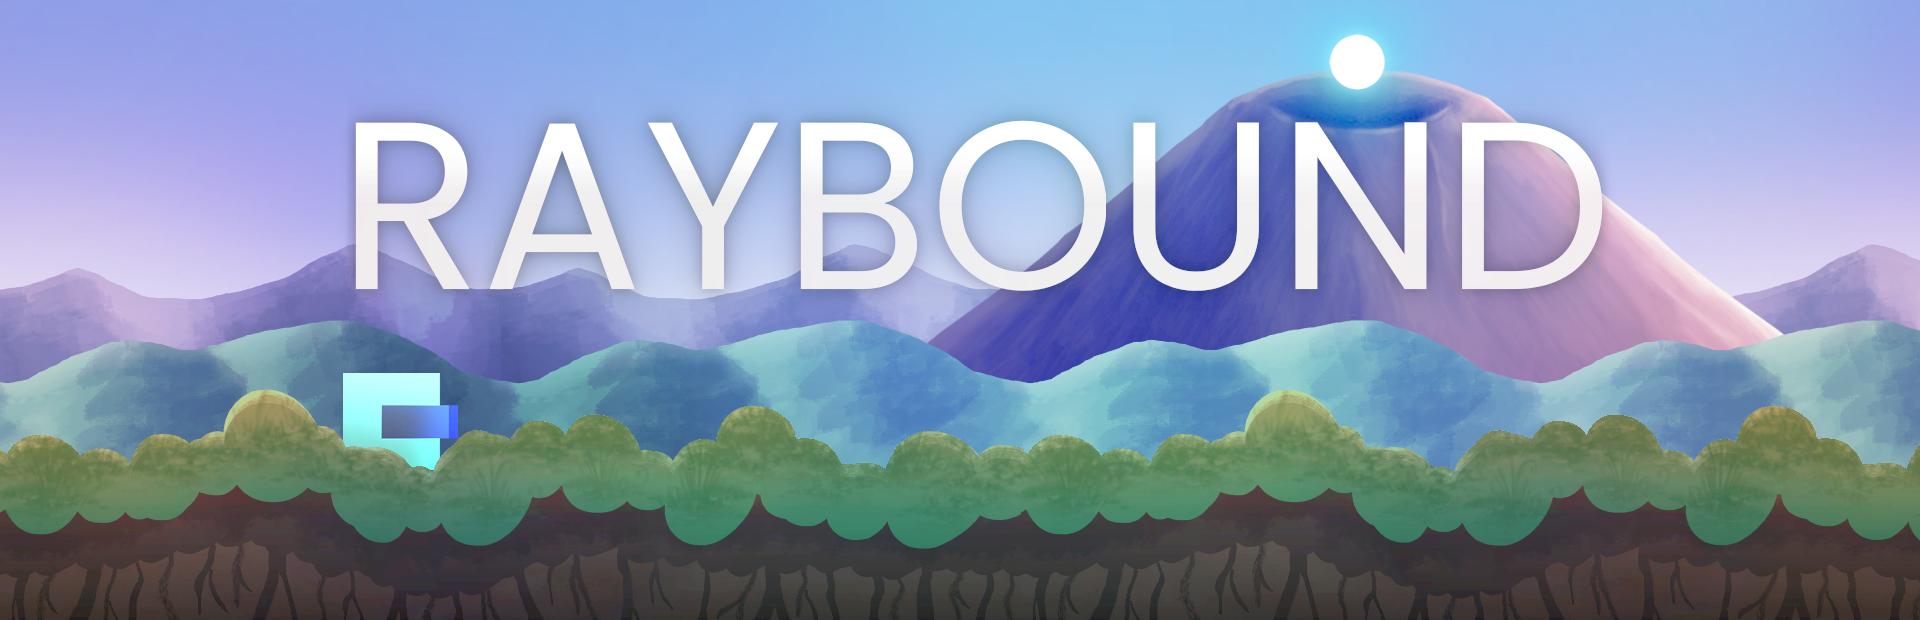 Raybound